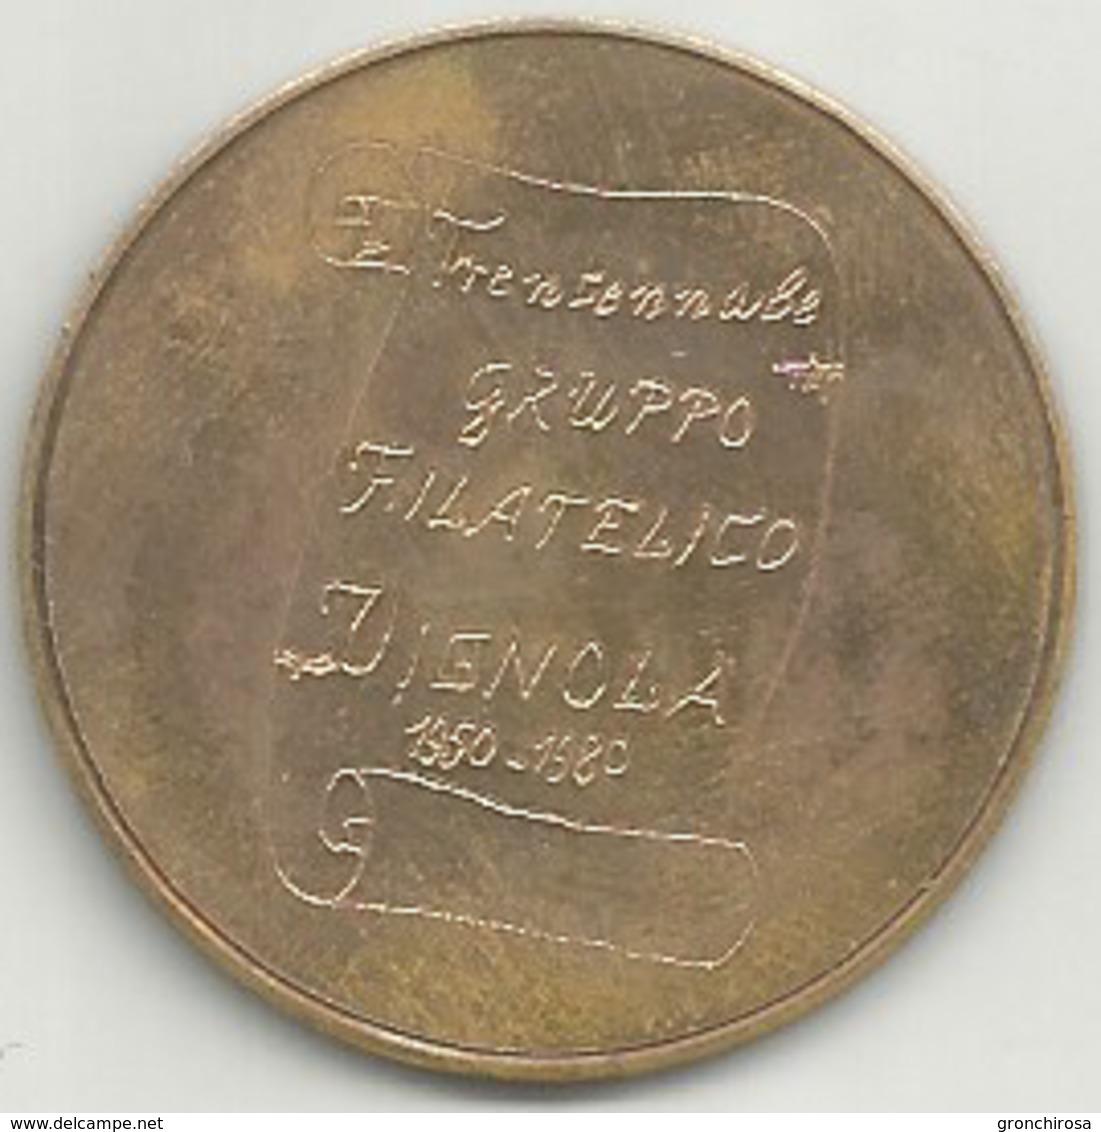 Vignola 1950 - 1980 Trentennale Gruppo Filatelico, Francobollo Provincie Modenesi, Cu., Gr. 12, Cm. 3,3. - Altri